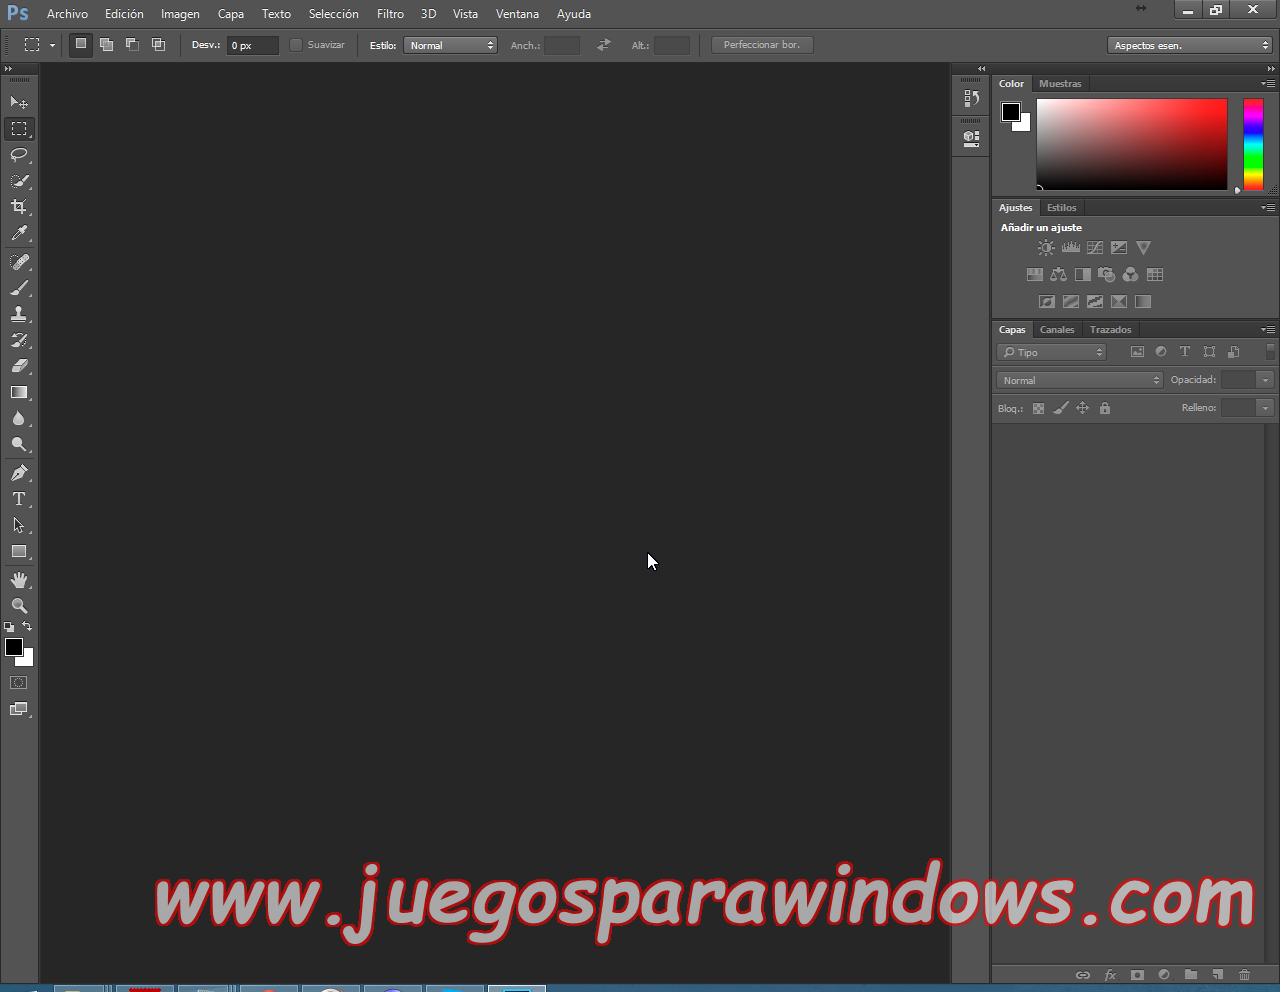 Adobe Photoshop CC 2014 v15.1 Multilenguaje ESPAÑOL 9